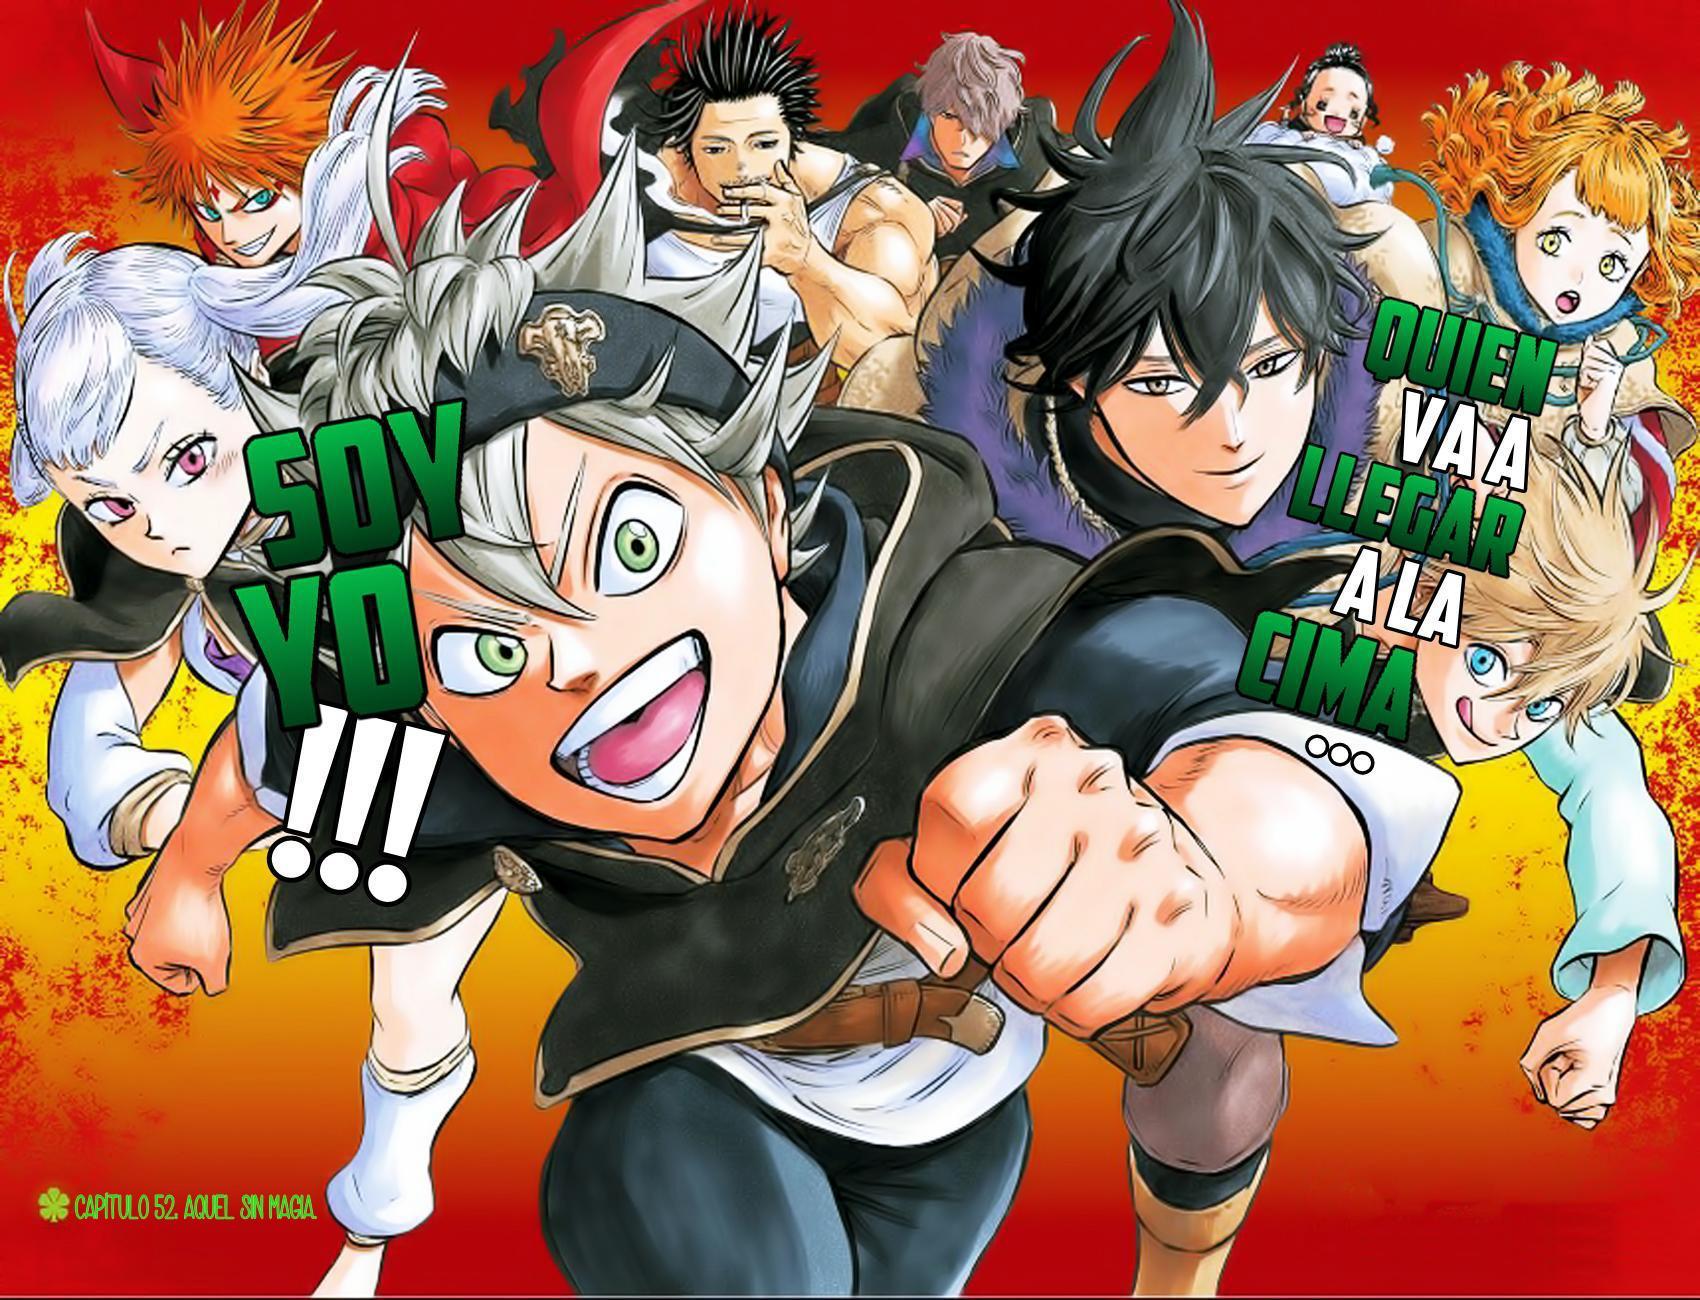 http://c5.ninemanga.com/es_manga/35/3811/449527/0f4213ed2bd688202f03003f0af35358.jpg Page 4